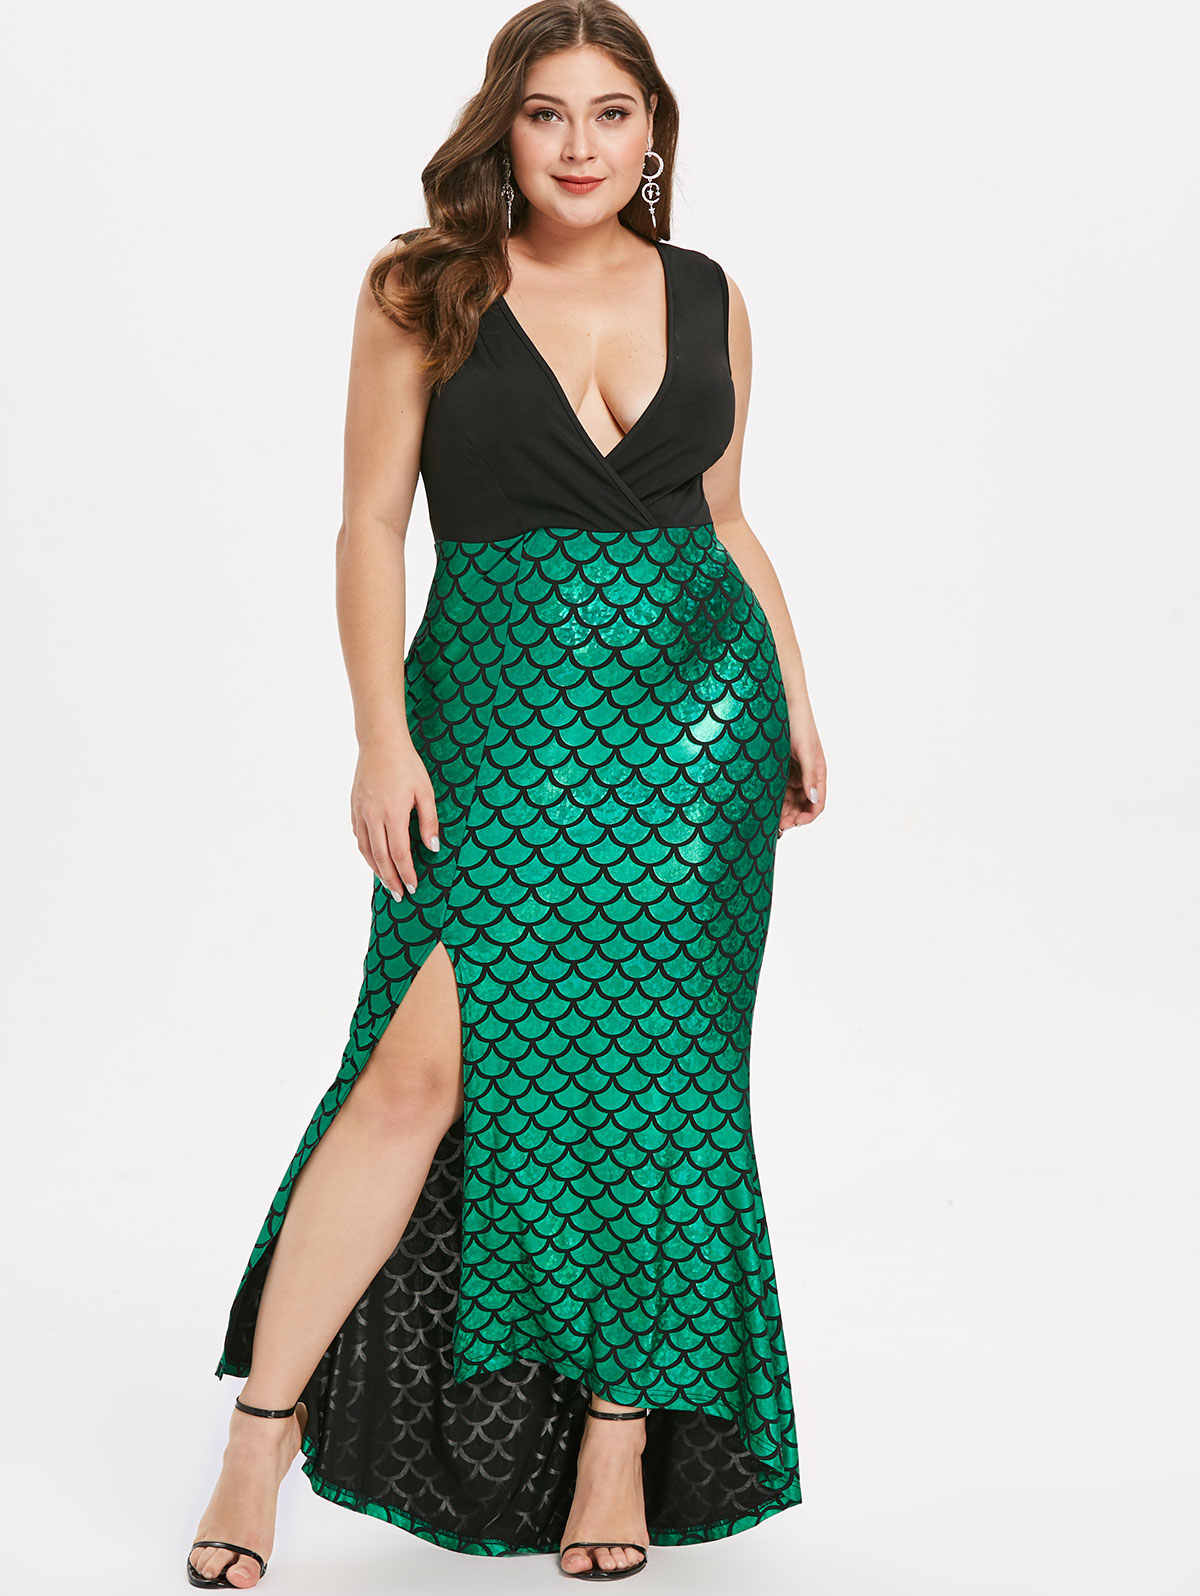 Wipalo Plus Size Fish Scale Asymmetric Slit Mermaid Dress Summer Women Sexy  Deep V-Neck add0c1a4057e